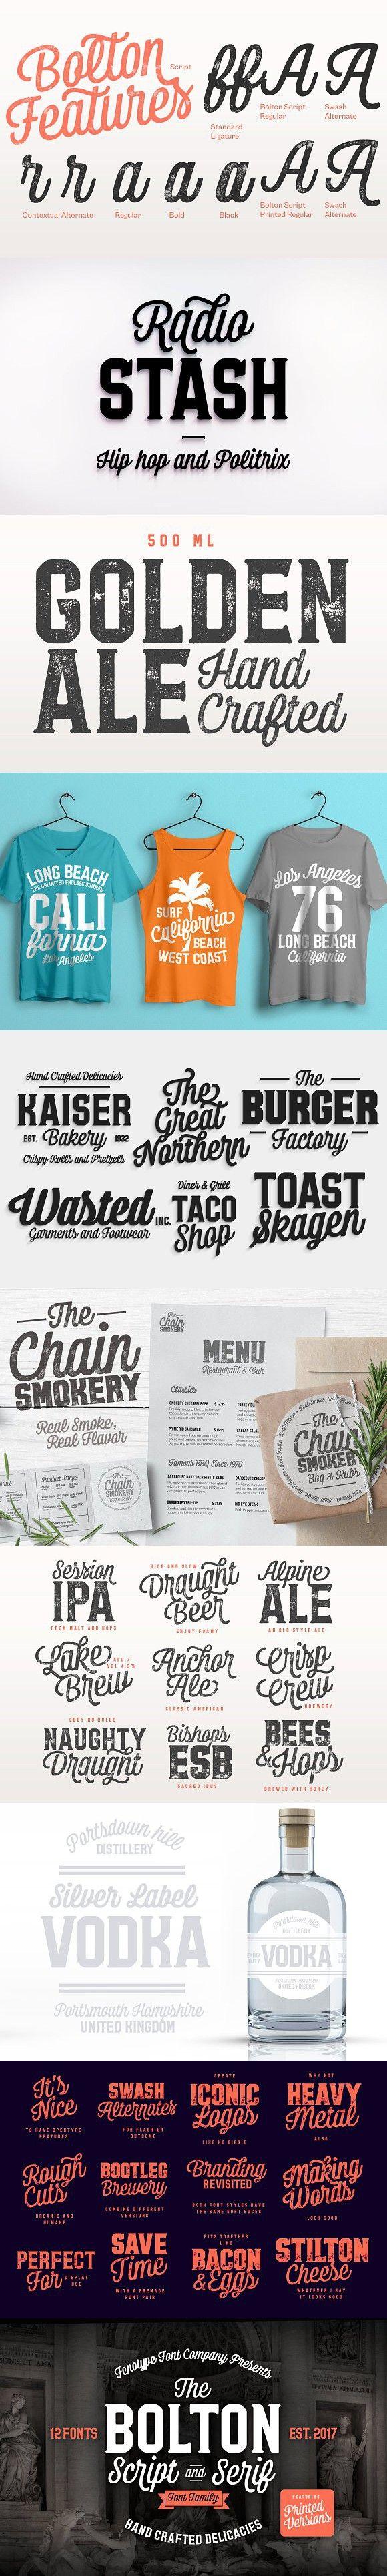 Download Bolton Font Pack -50% off intro sale | Font packs, Modern ...